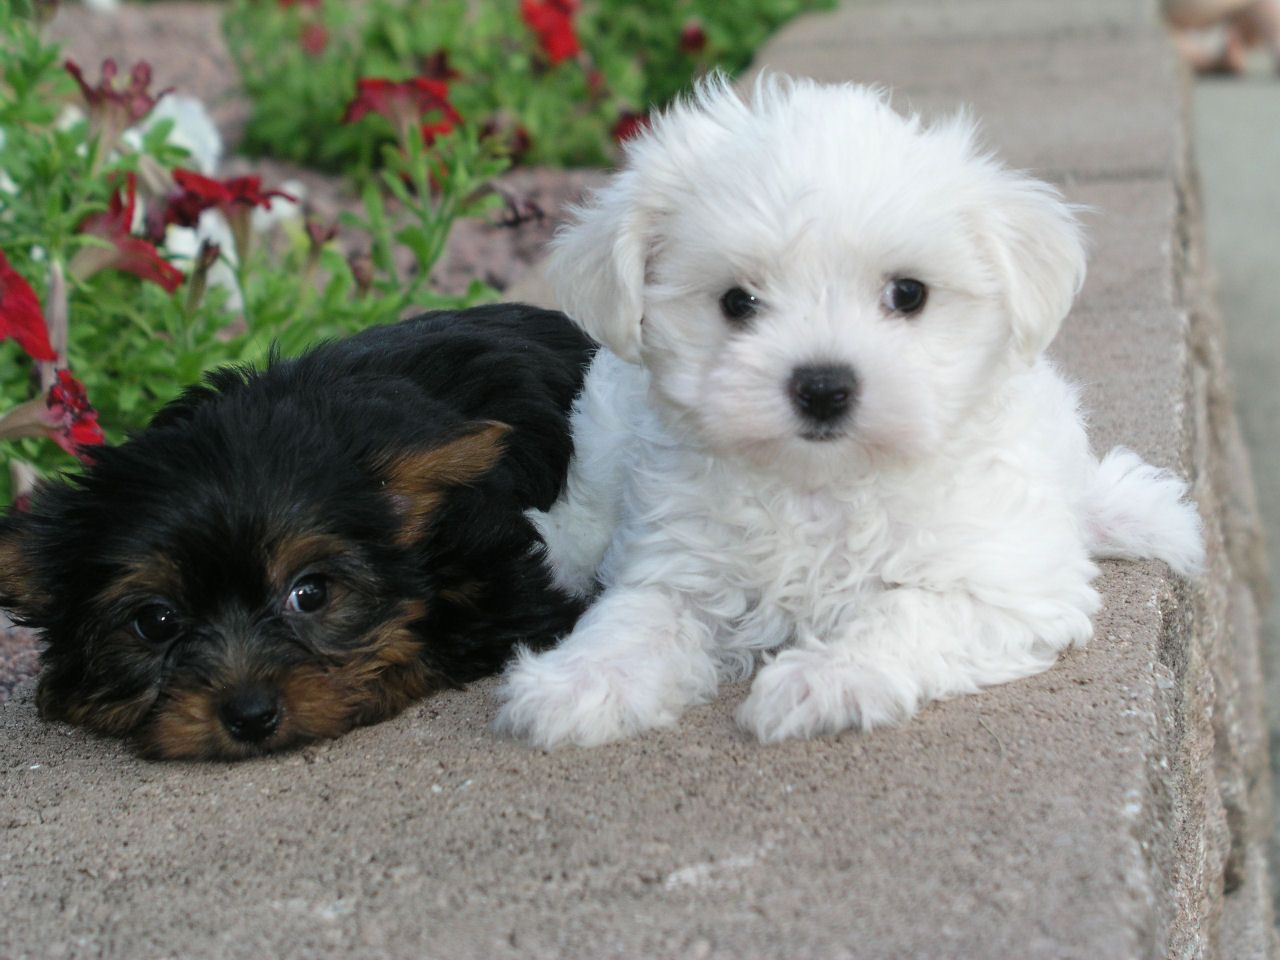 Shih Tzu Puppy Photos Shih Tzu Puppy Puppy Photos Puppies